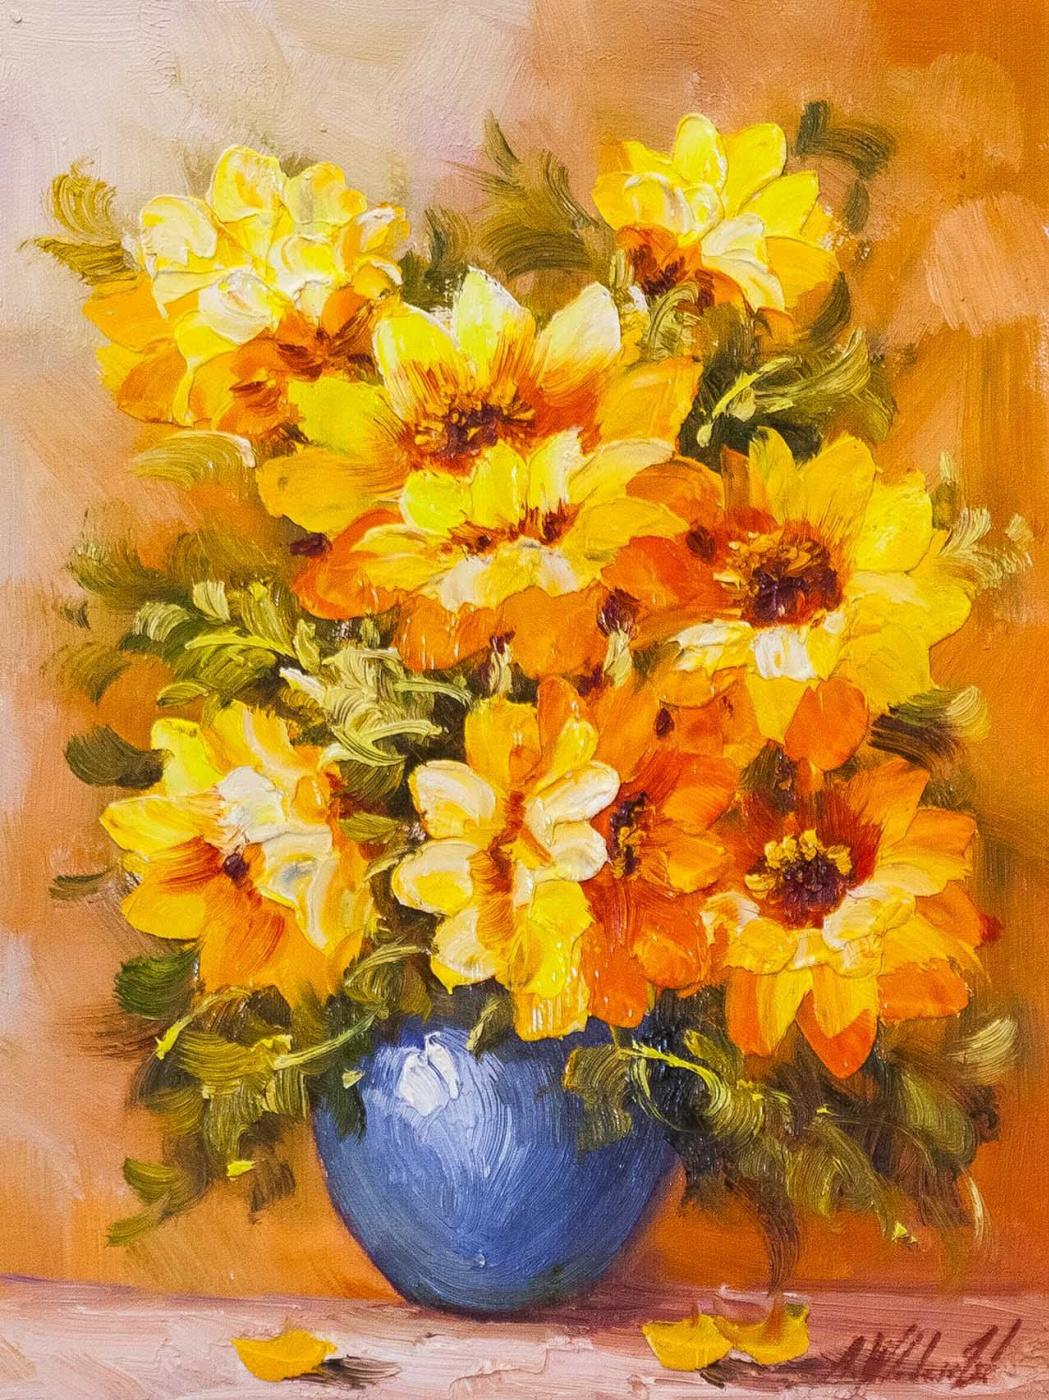 Andrzej Vlodarczyk. Sunflowers in a blue vase N2